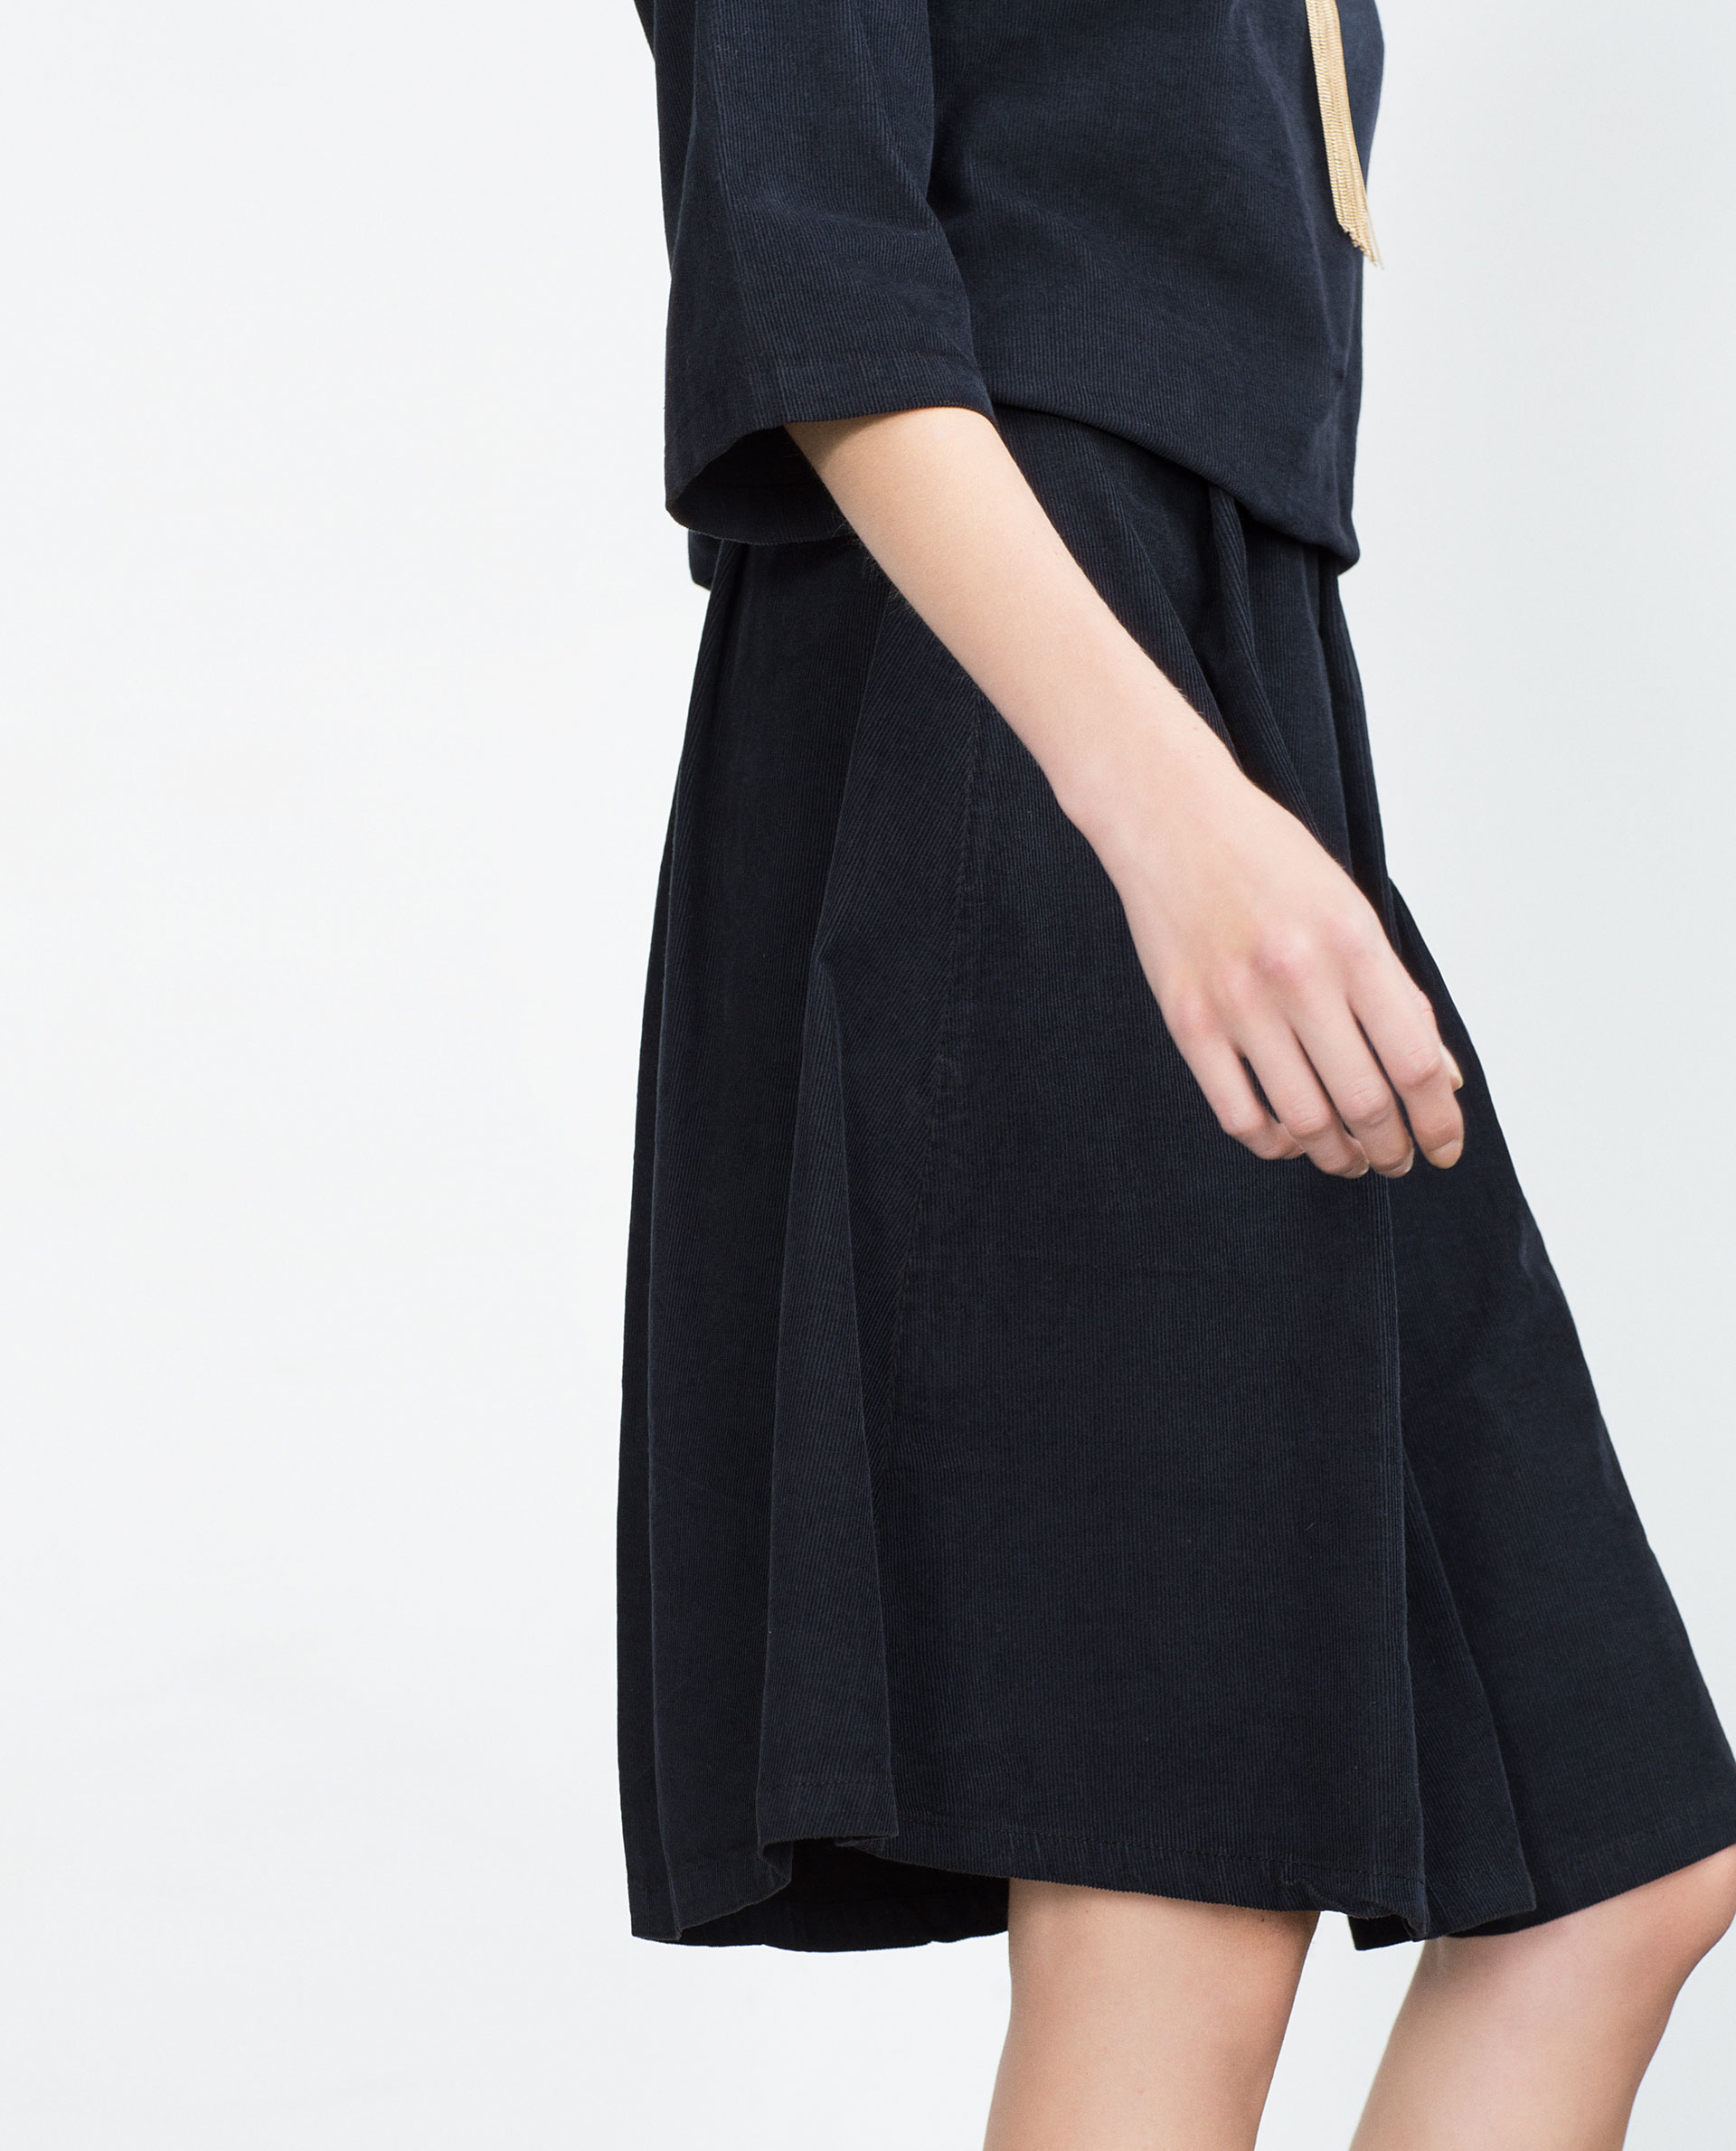 Blue Corduroy Skirt 11